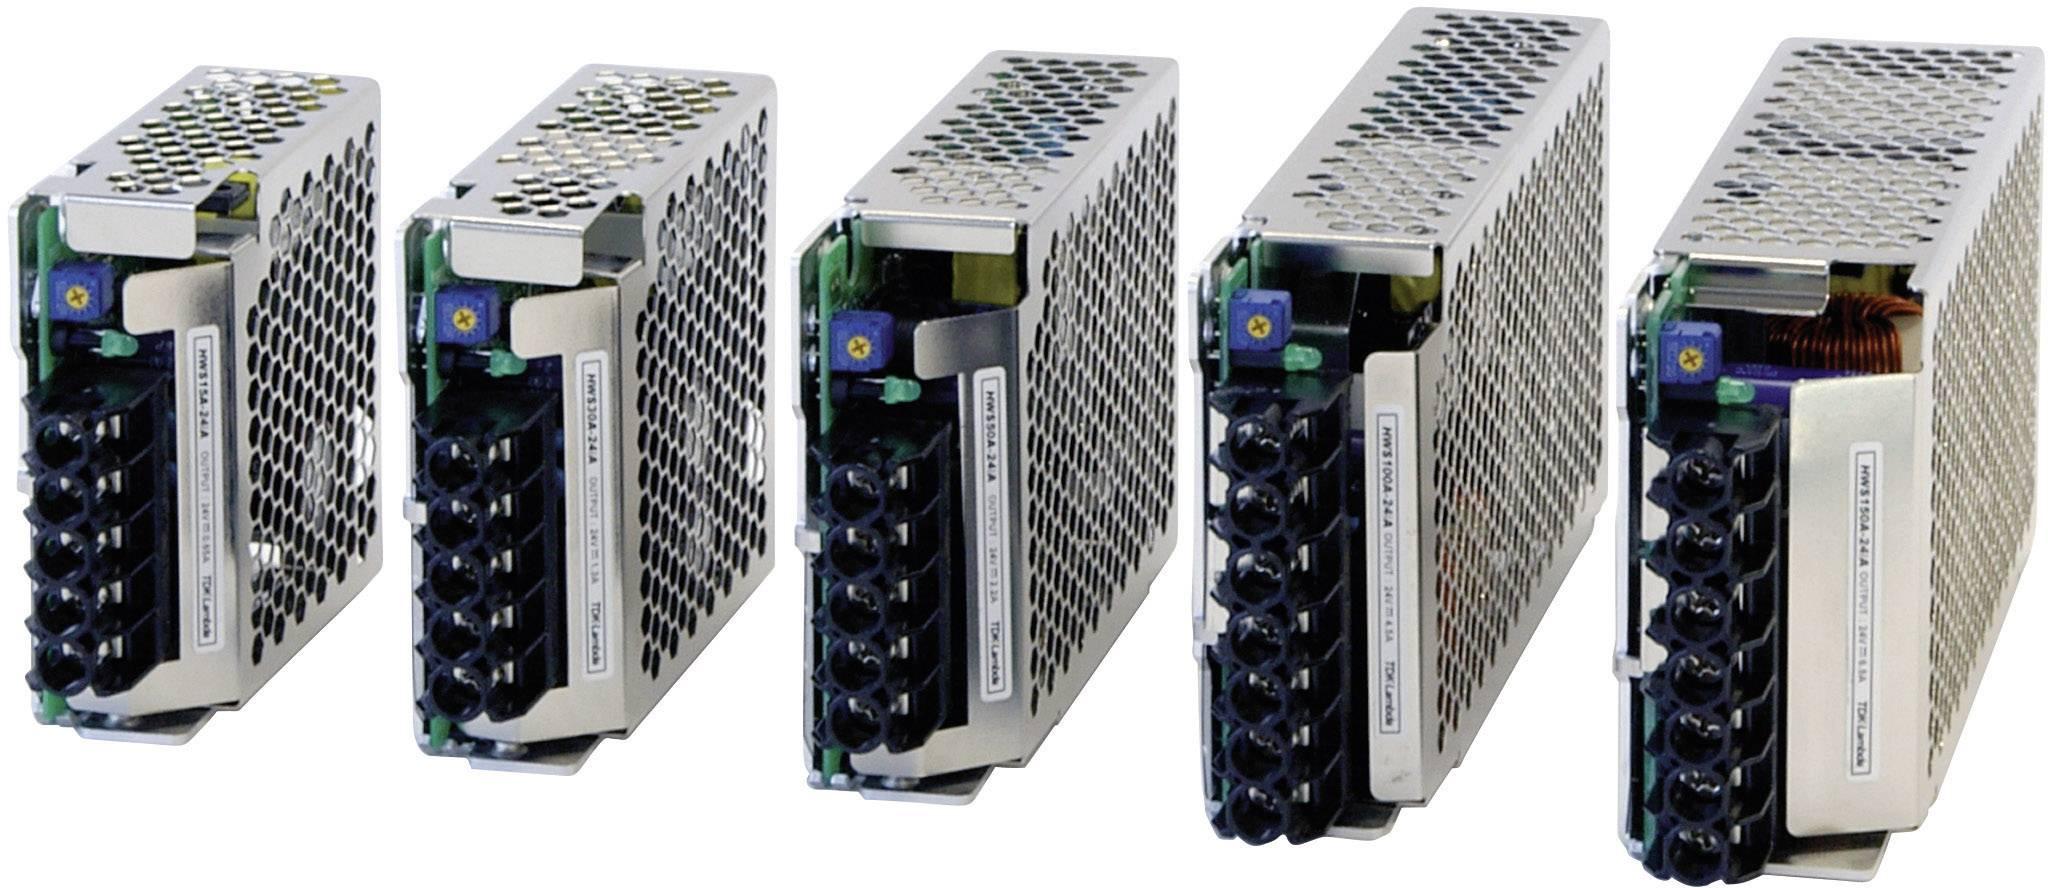 Zabudovateľný napájací zdroj TDK-Lambda HWS-50A-24/A, 24 V, 52,8 W